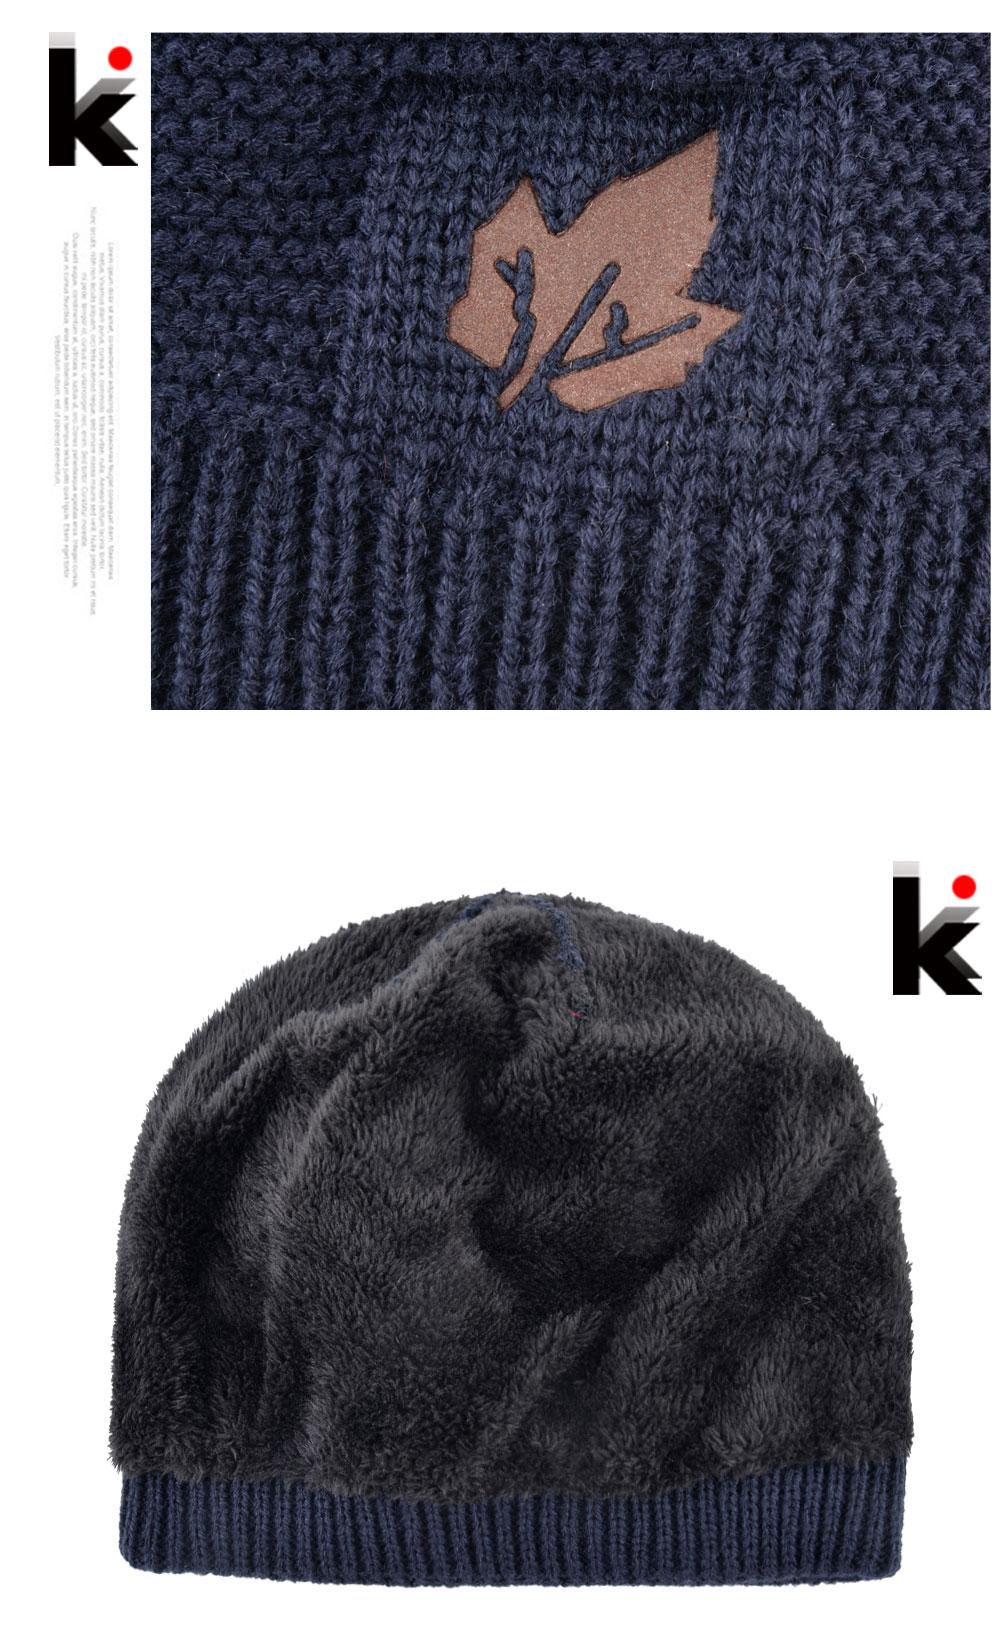 13c71333bf0 2018 Men Winter Hat Scarf Sets Fashion Maple Leaf Knitted Skullies Beanies  Man Thick Add Velvet Knit Bonnet Cap Boys Scarves Set